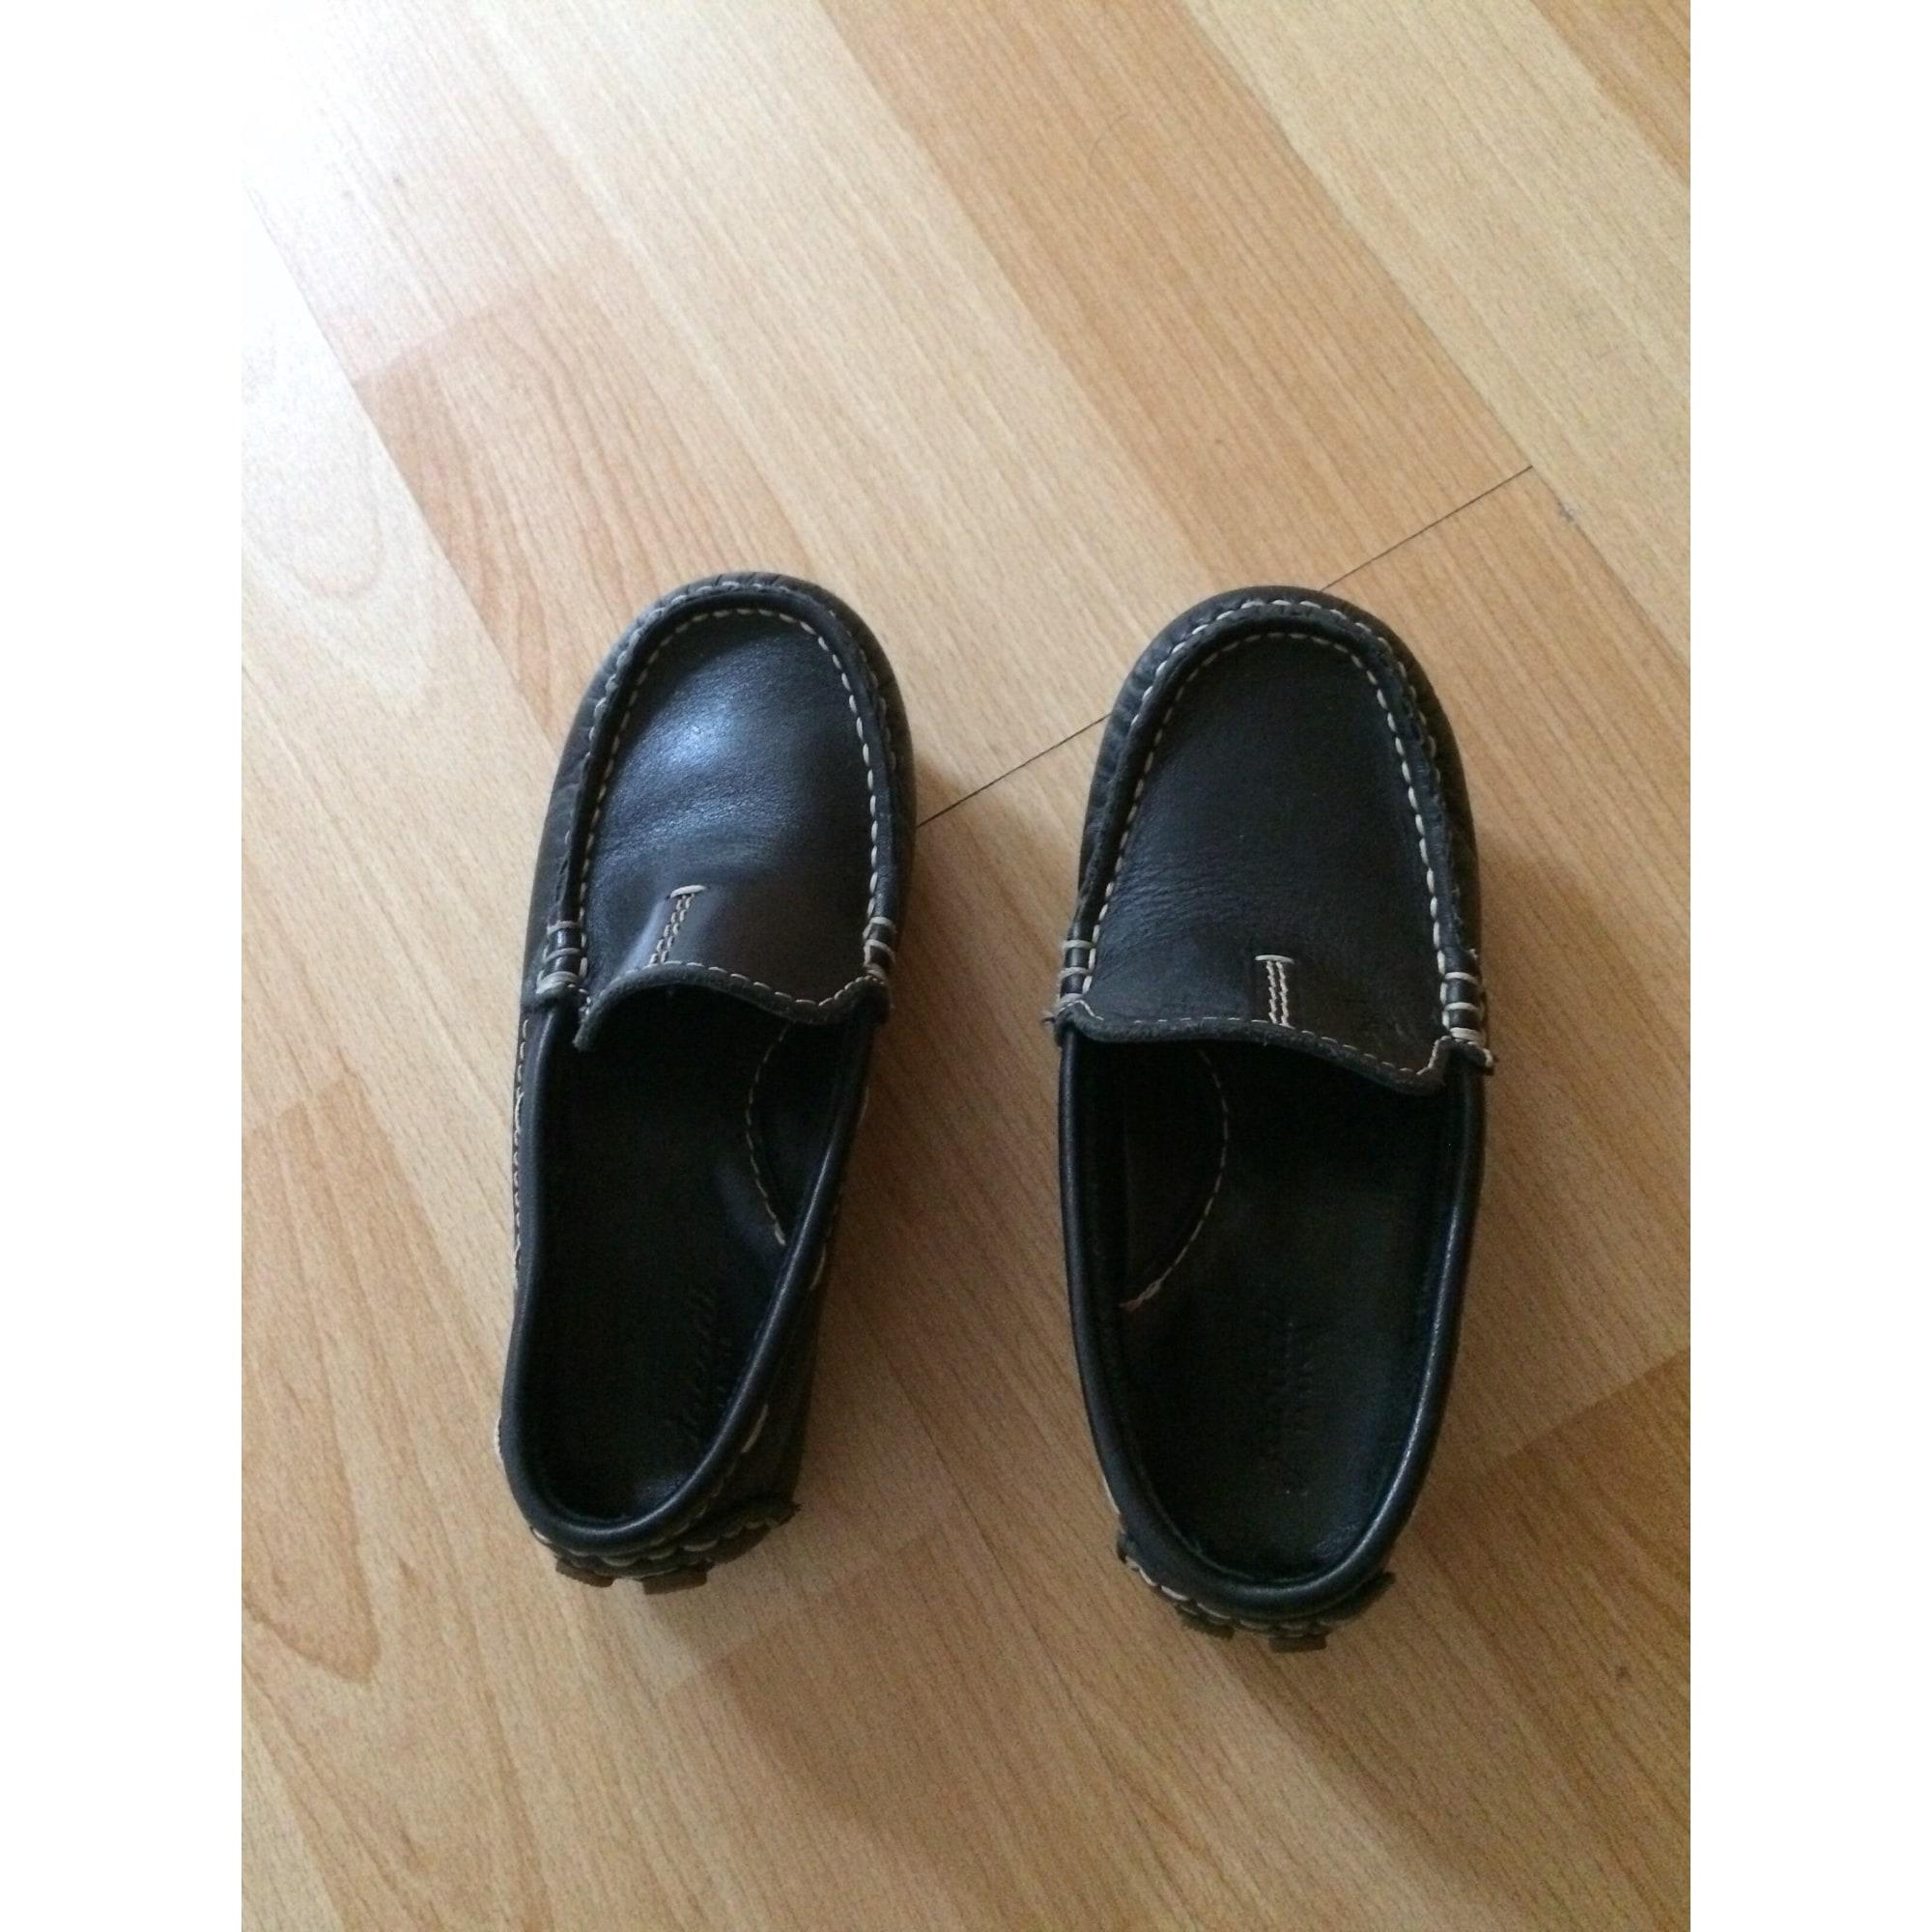 Loafers JACADI Blue, navy, turquoise